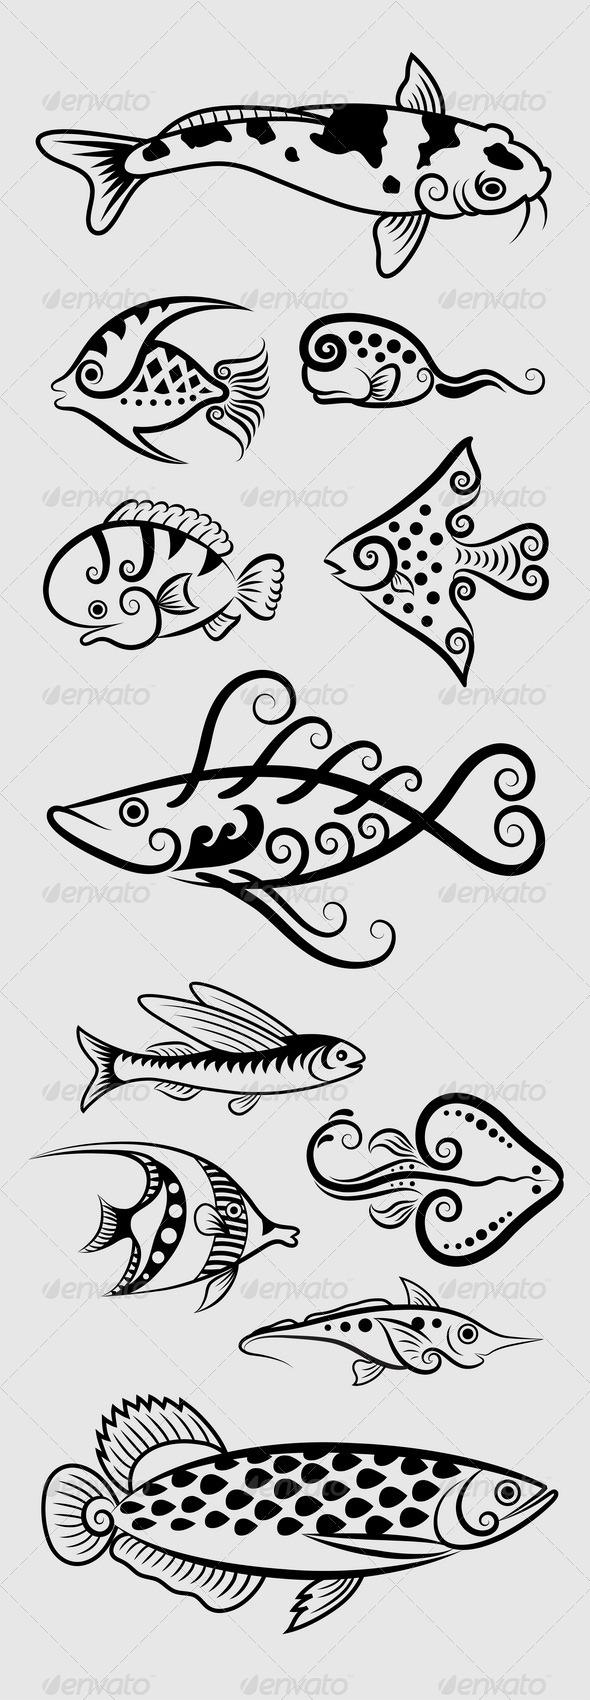 Decorative Fish Symbols - Animals Characters